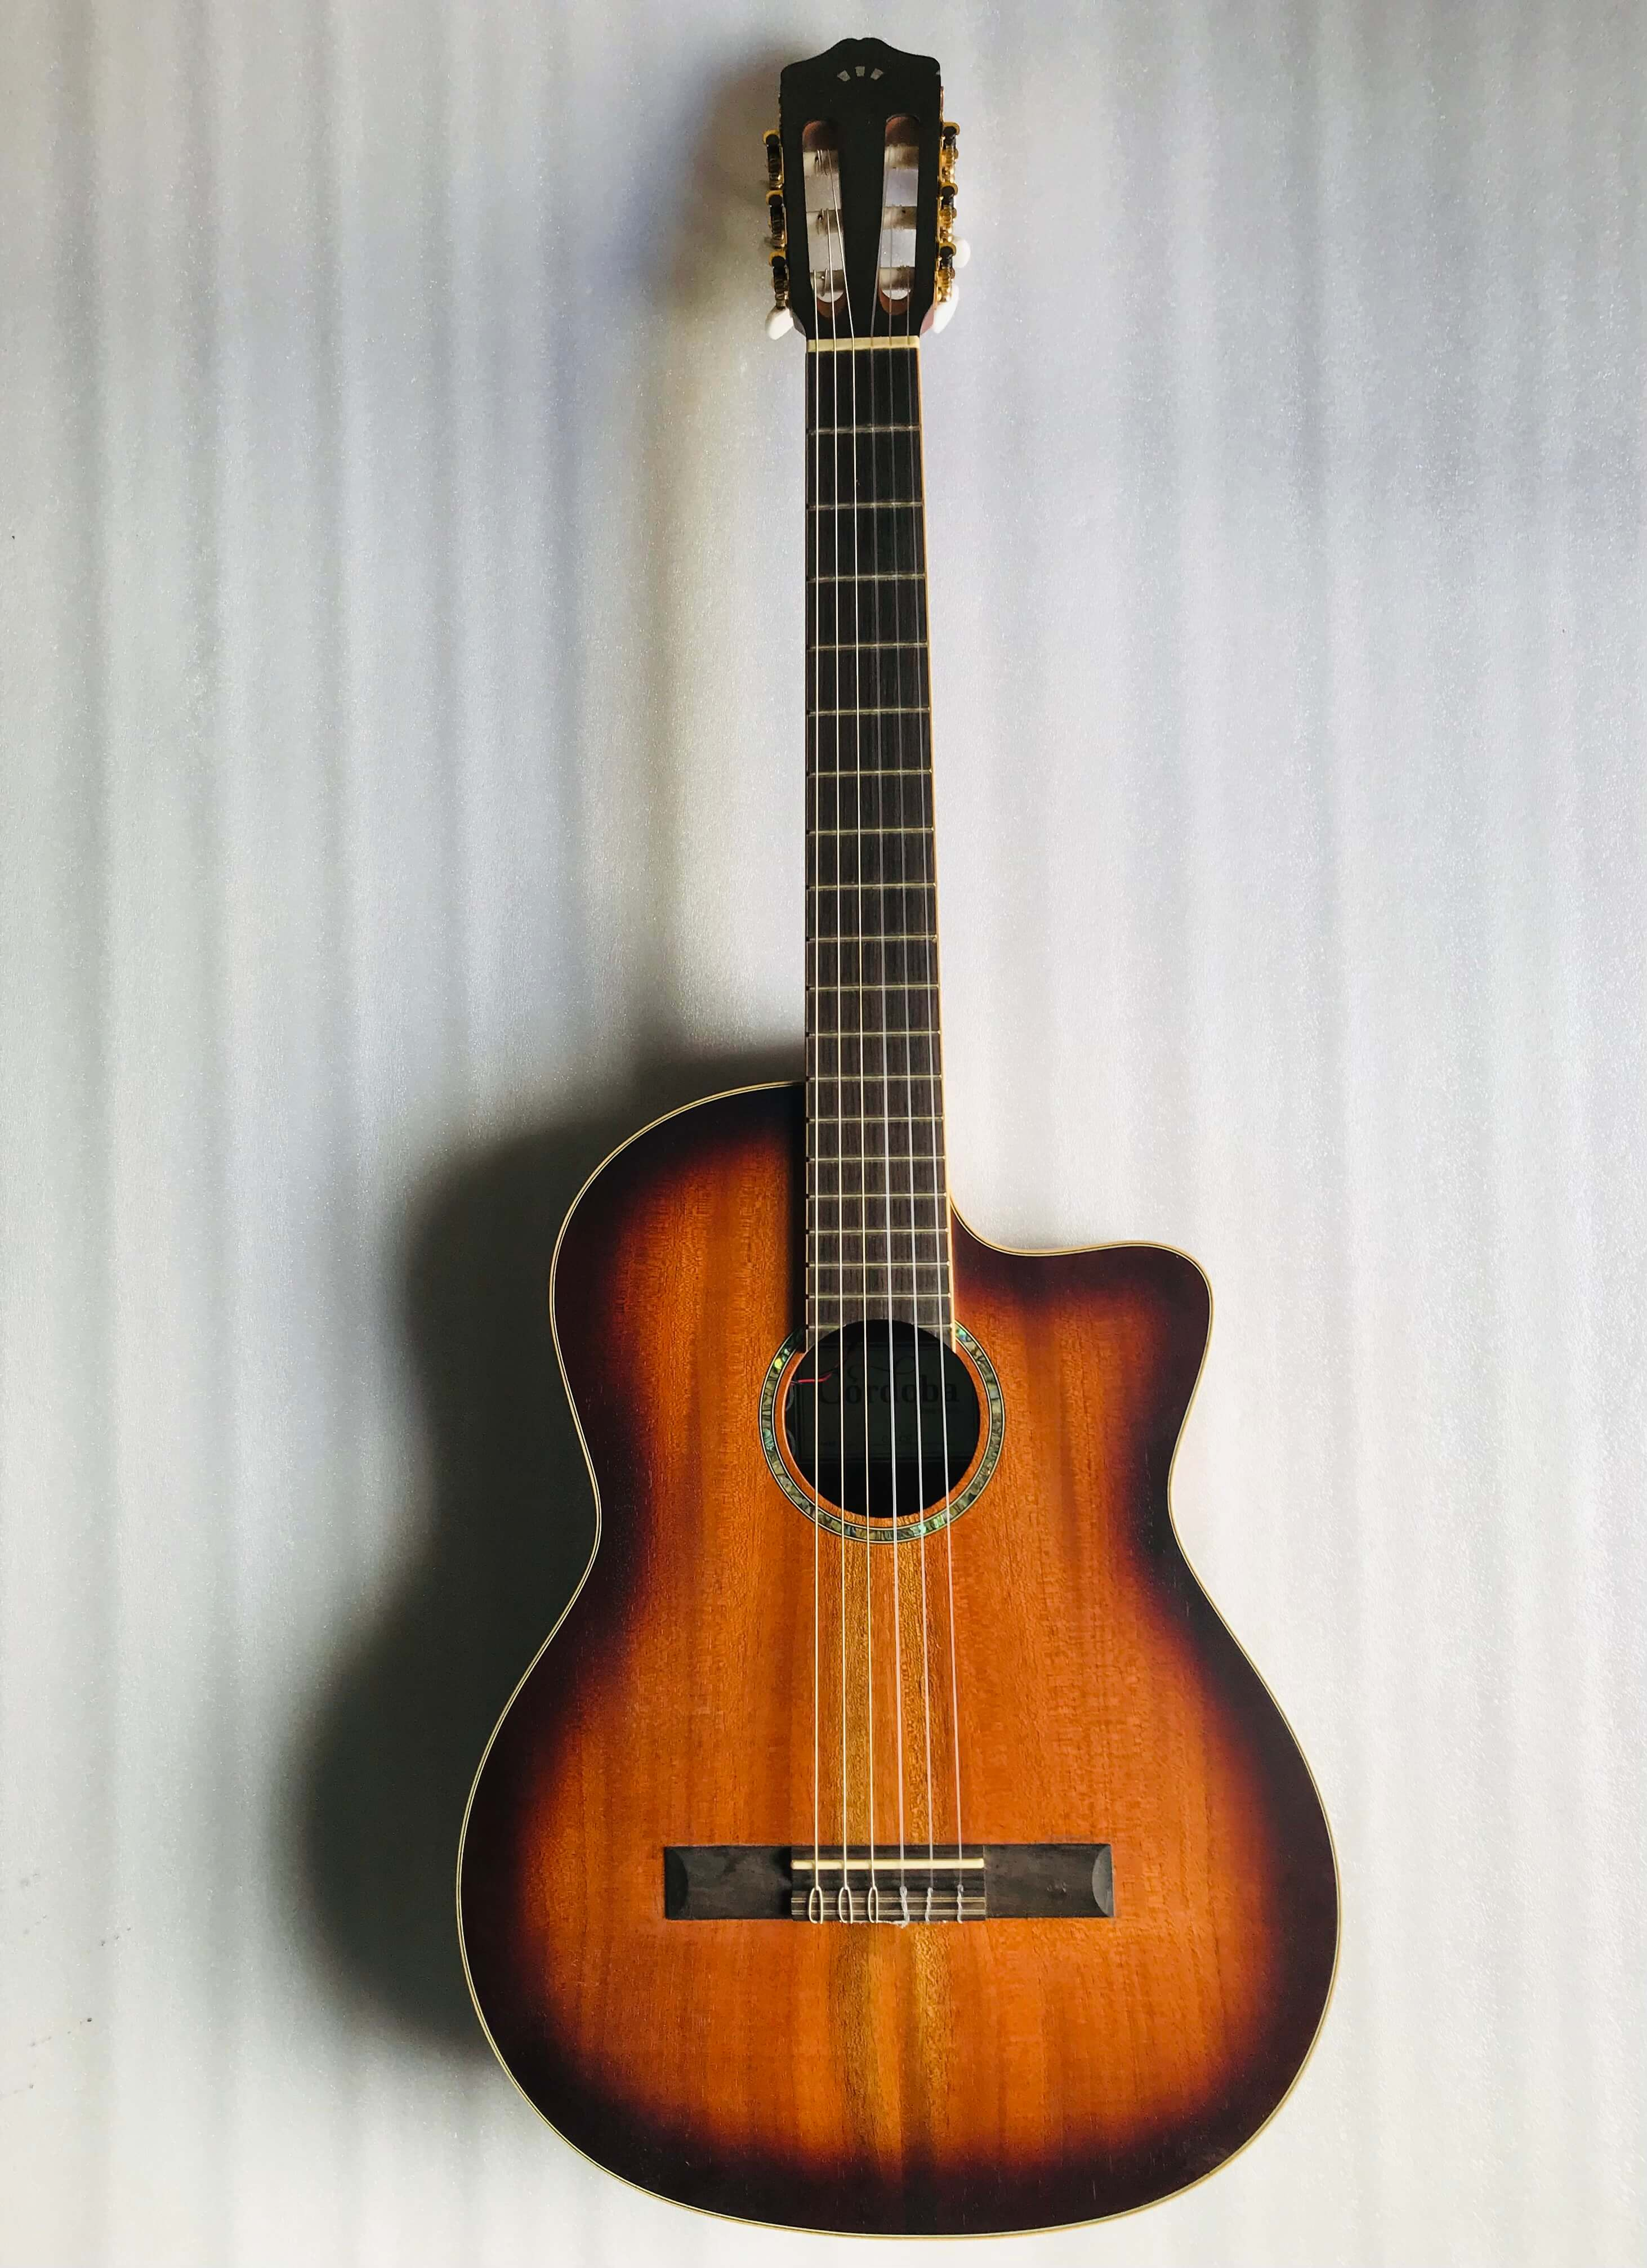 Cordoba C4-CE Classical Guitar Edgeburst Solid Mahogany Top